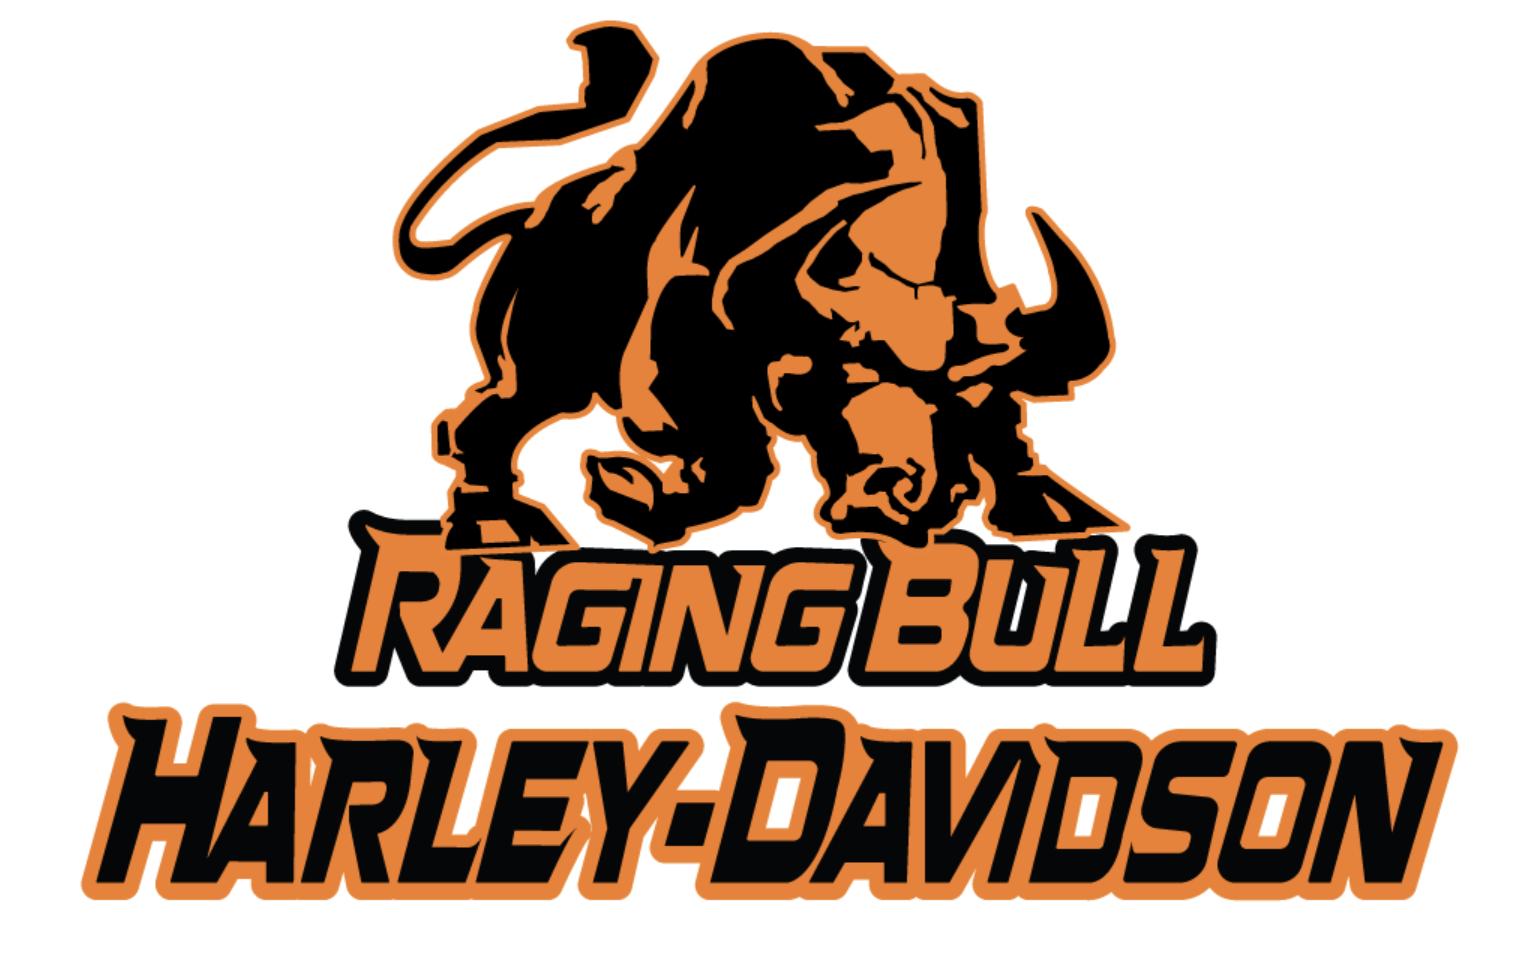 Raging Bull Harley-Davidson